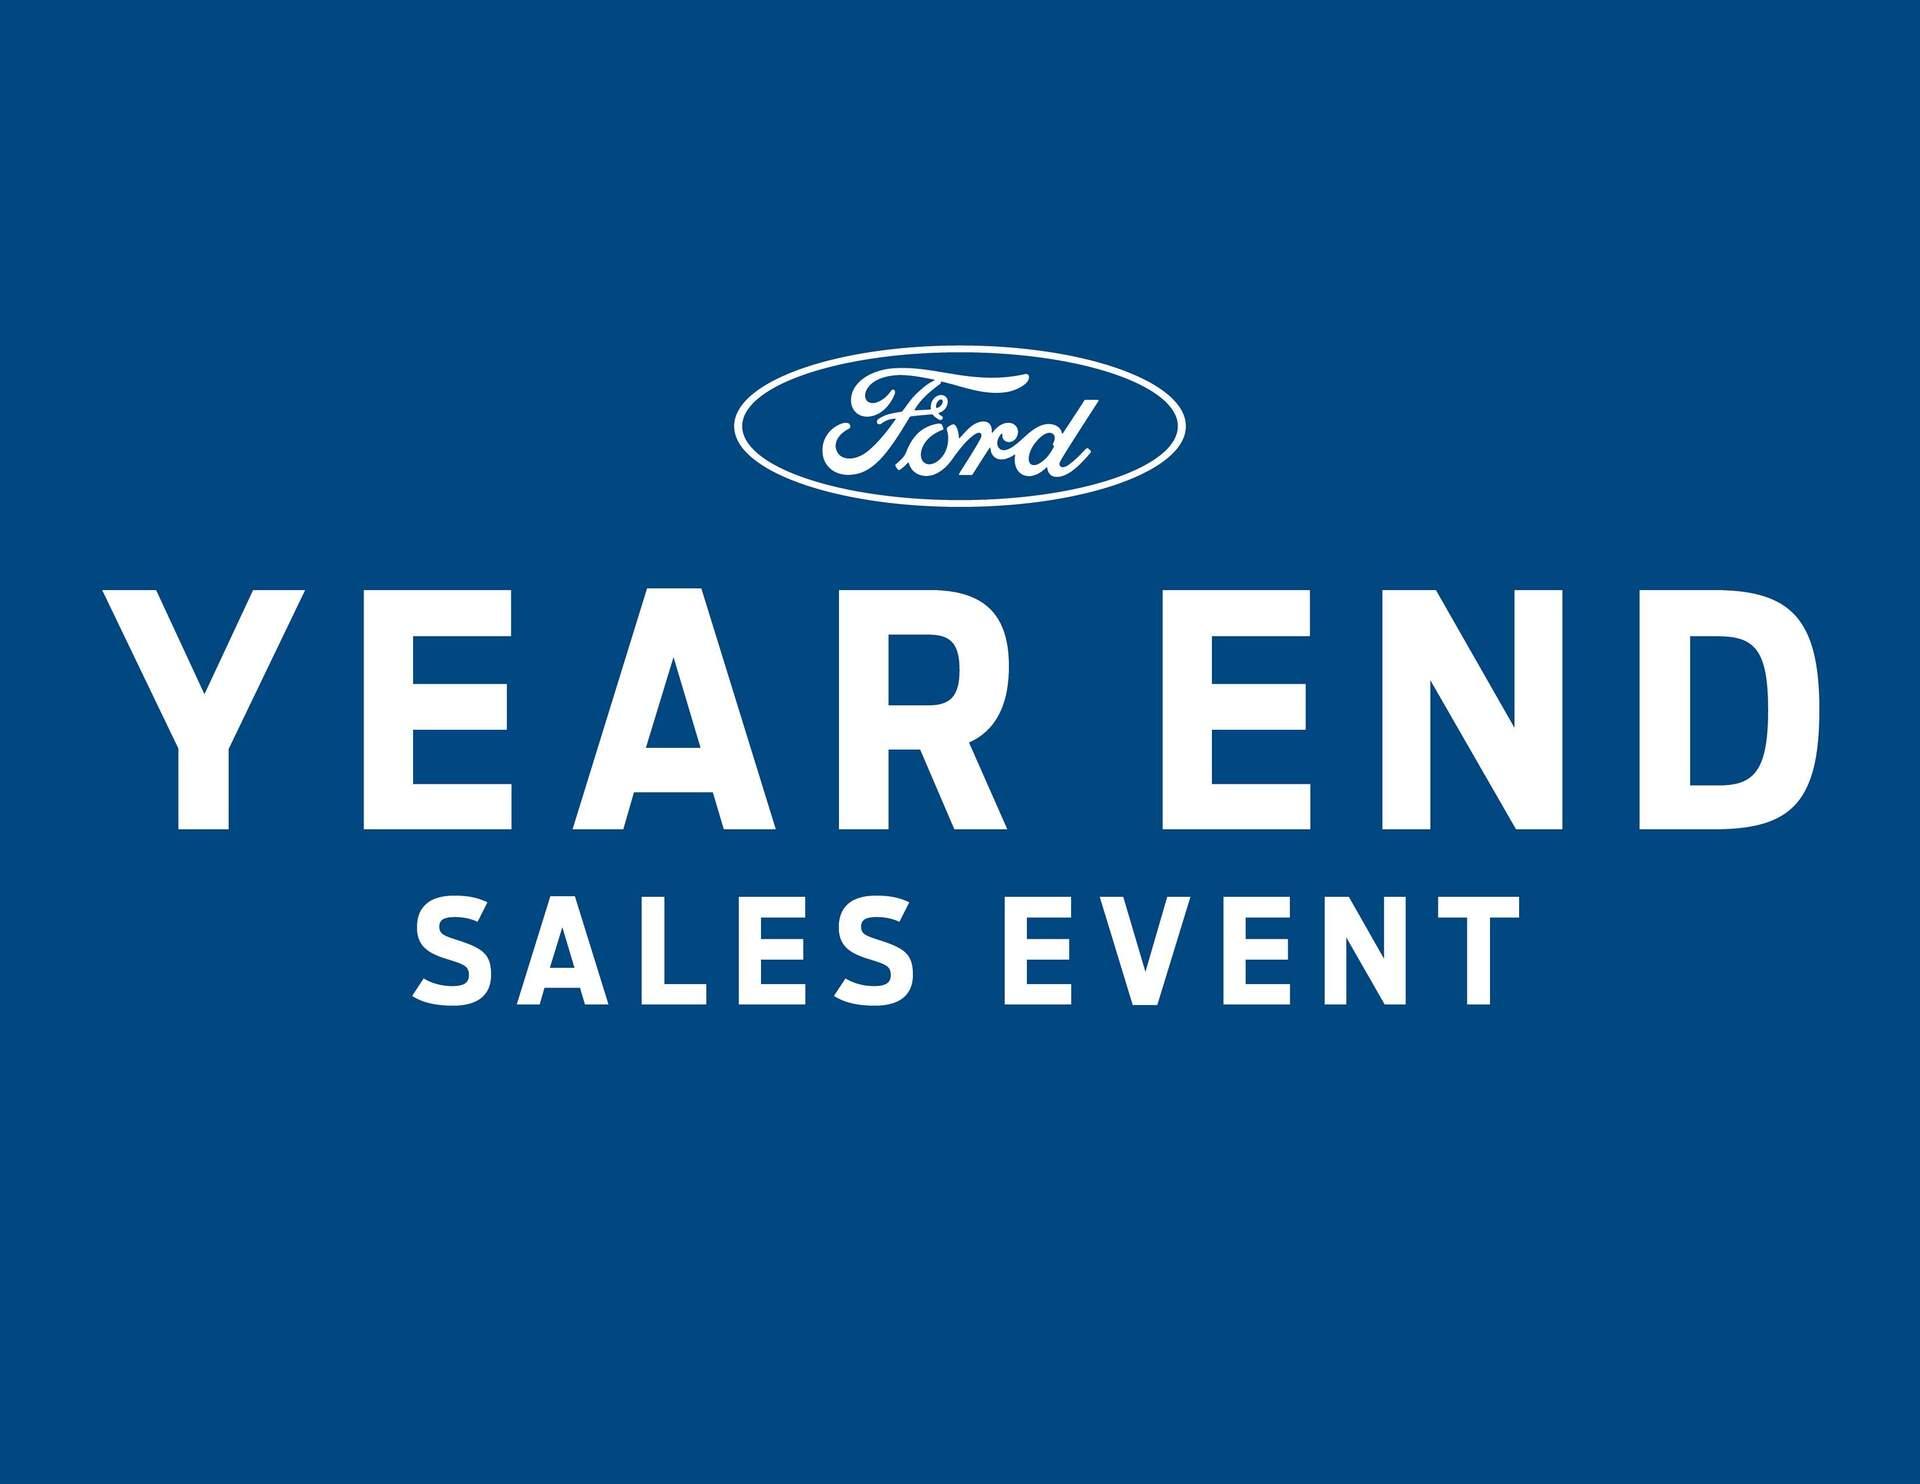 Sheboygan Ford Dealer >> Ford Dealership Sheboygan Wi Used Cars Dick Brantmeier